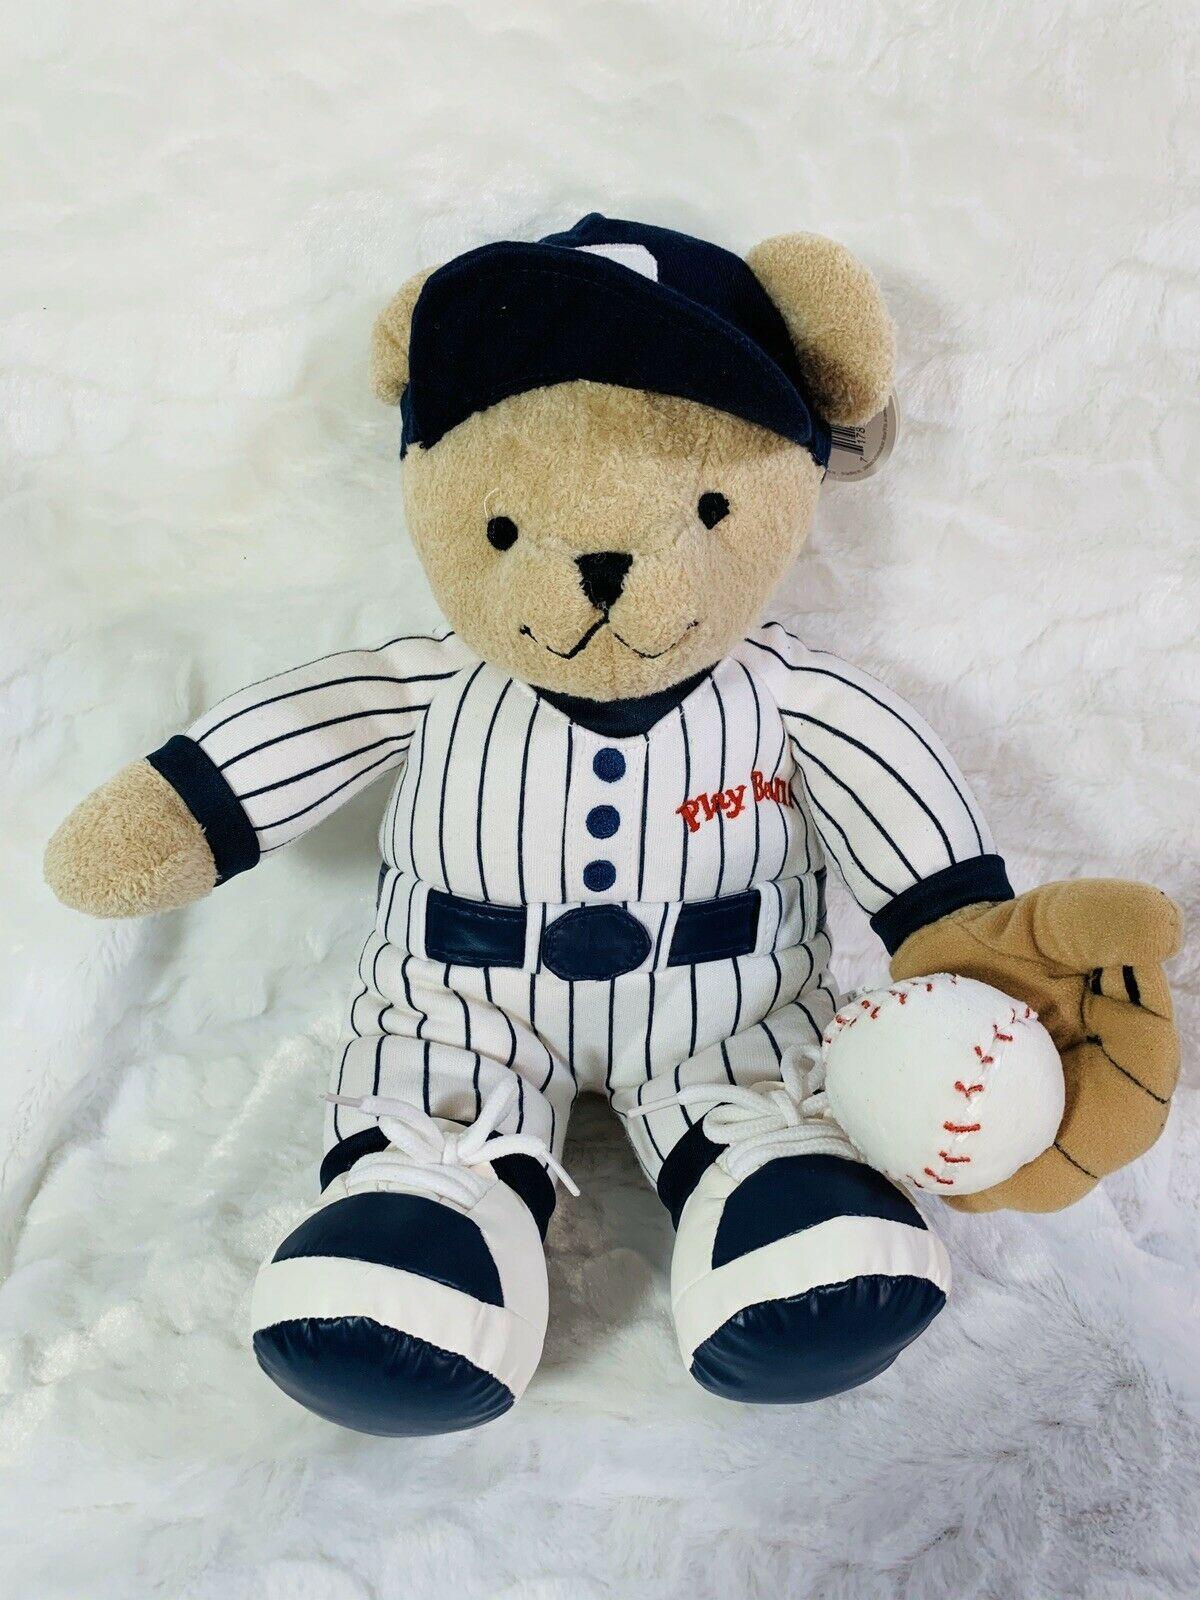 Koala Baby Play Ball Teddy Bear New - $10.69